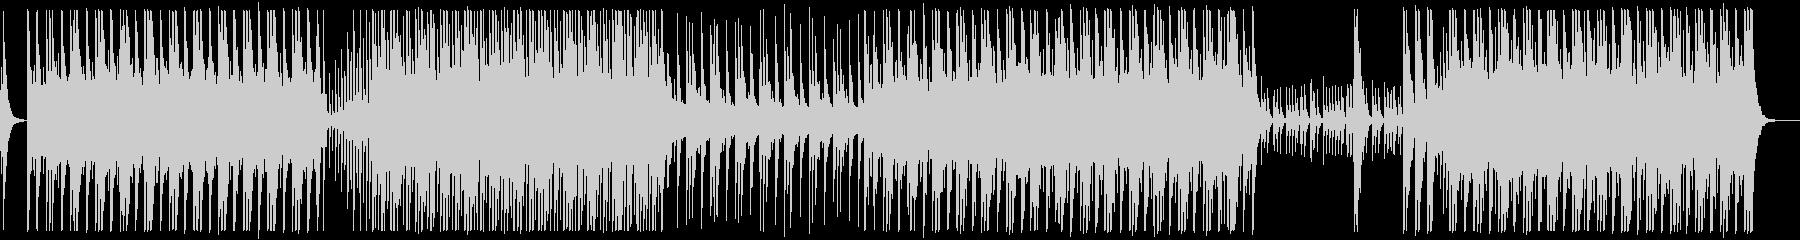 Mokuzendouの未再生の波形